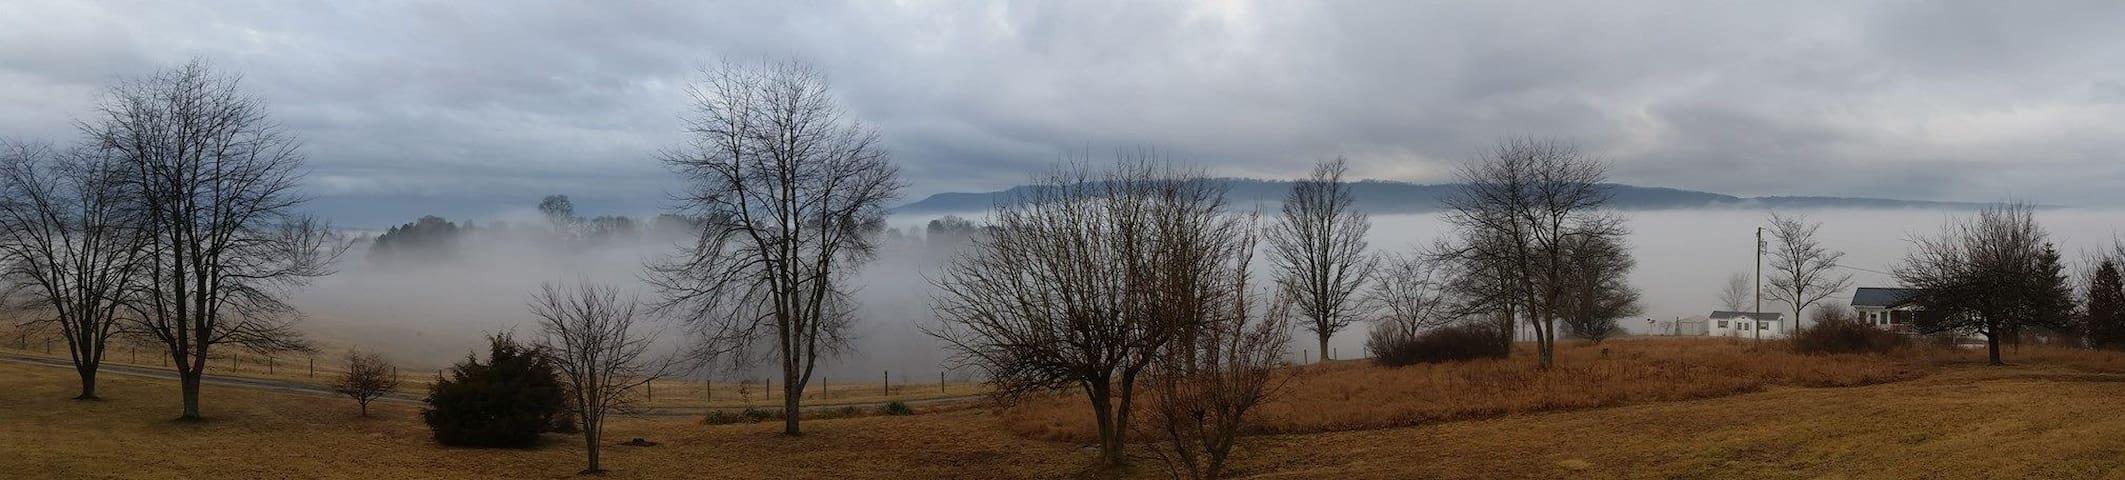 Winter cloud forest morning fog